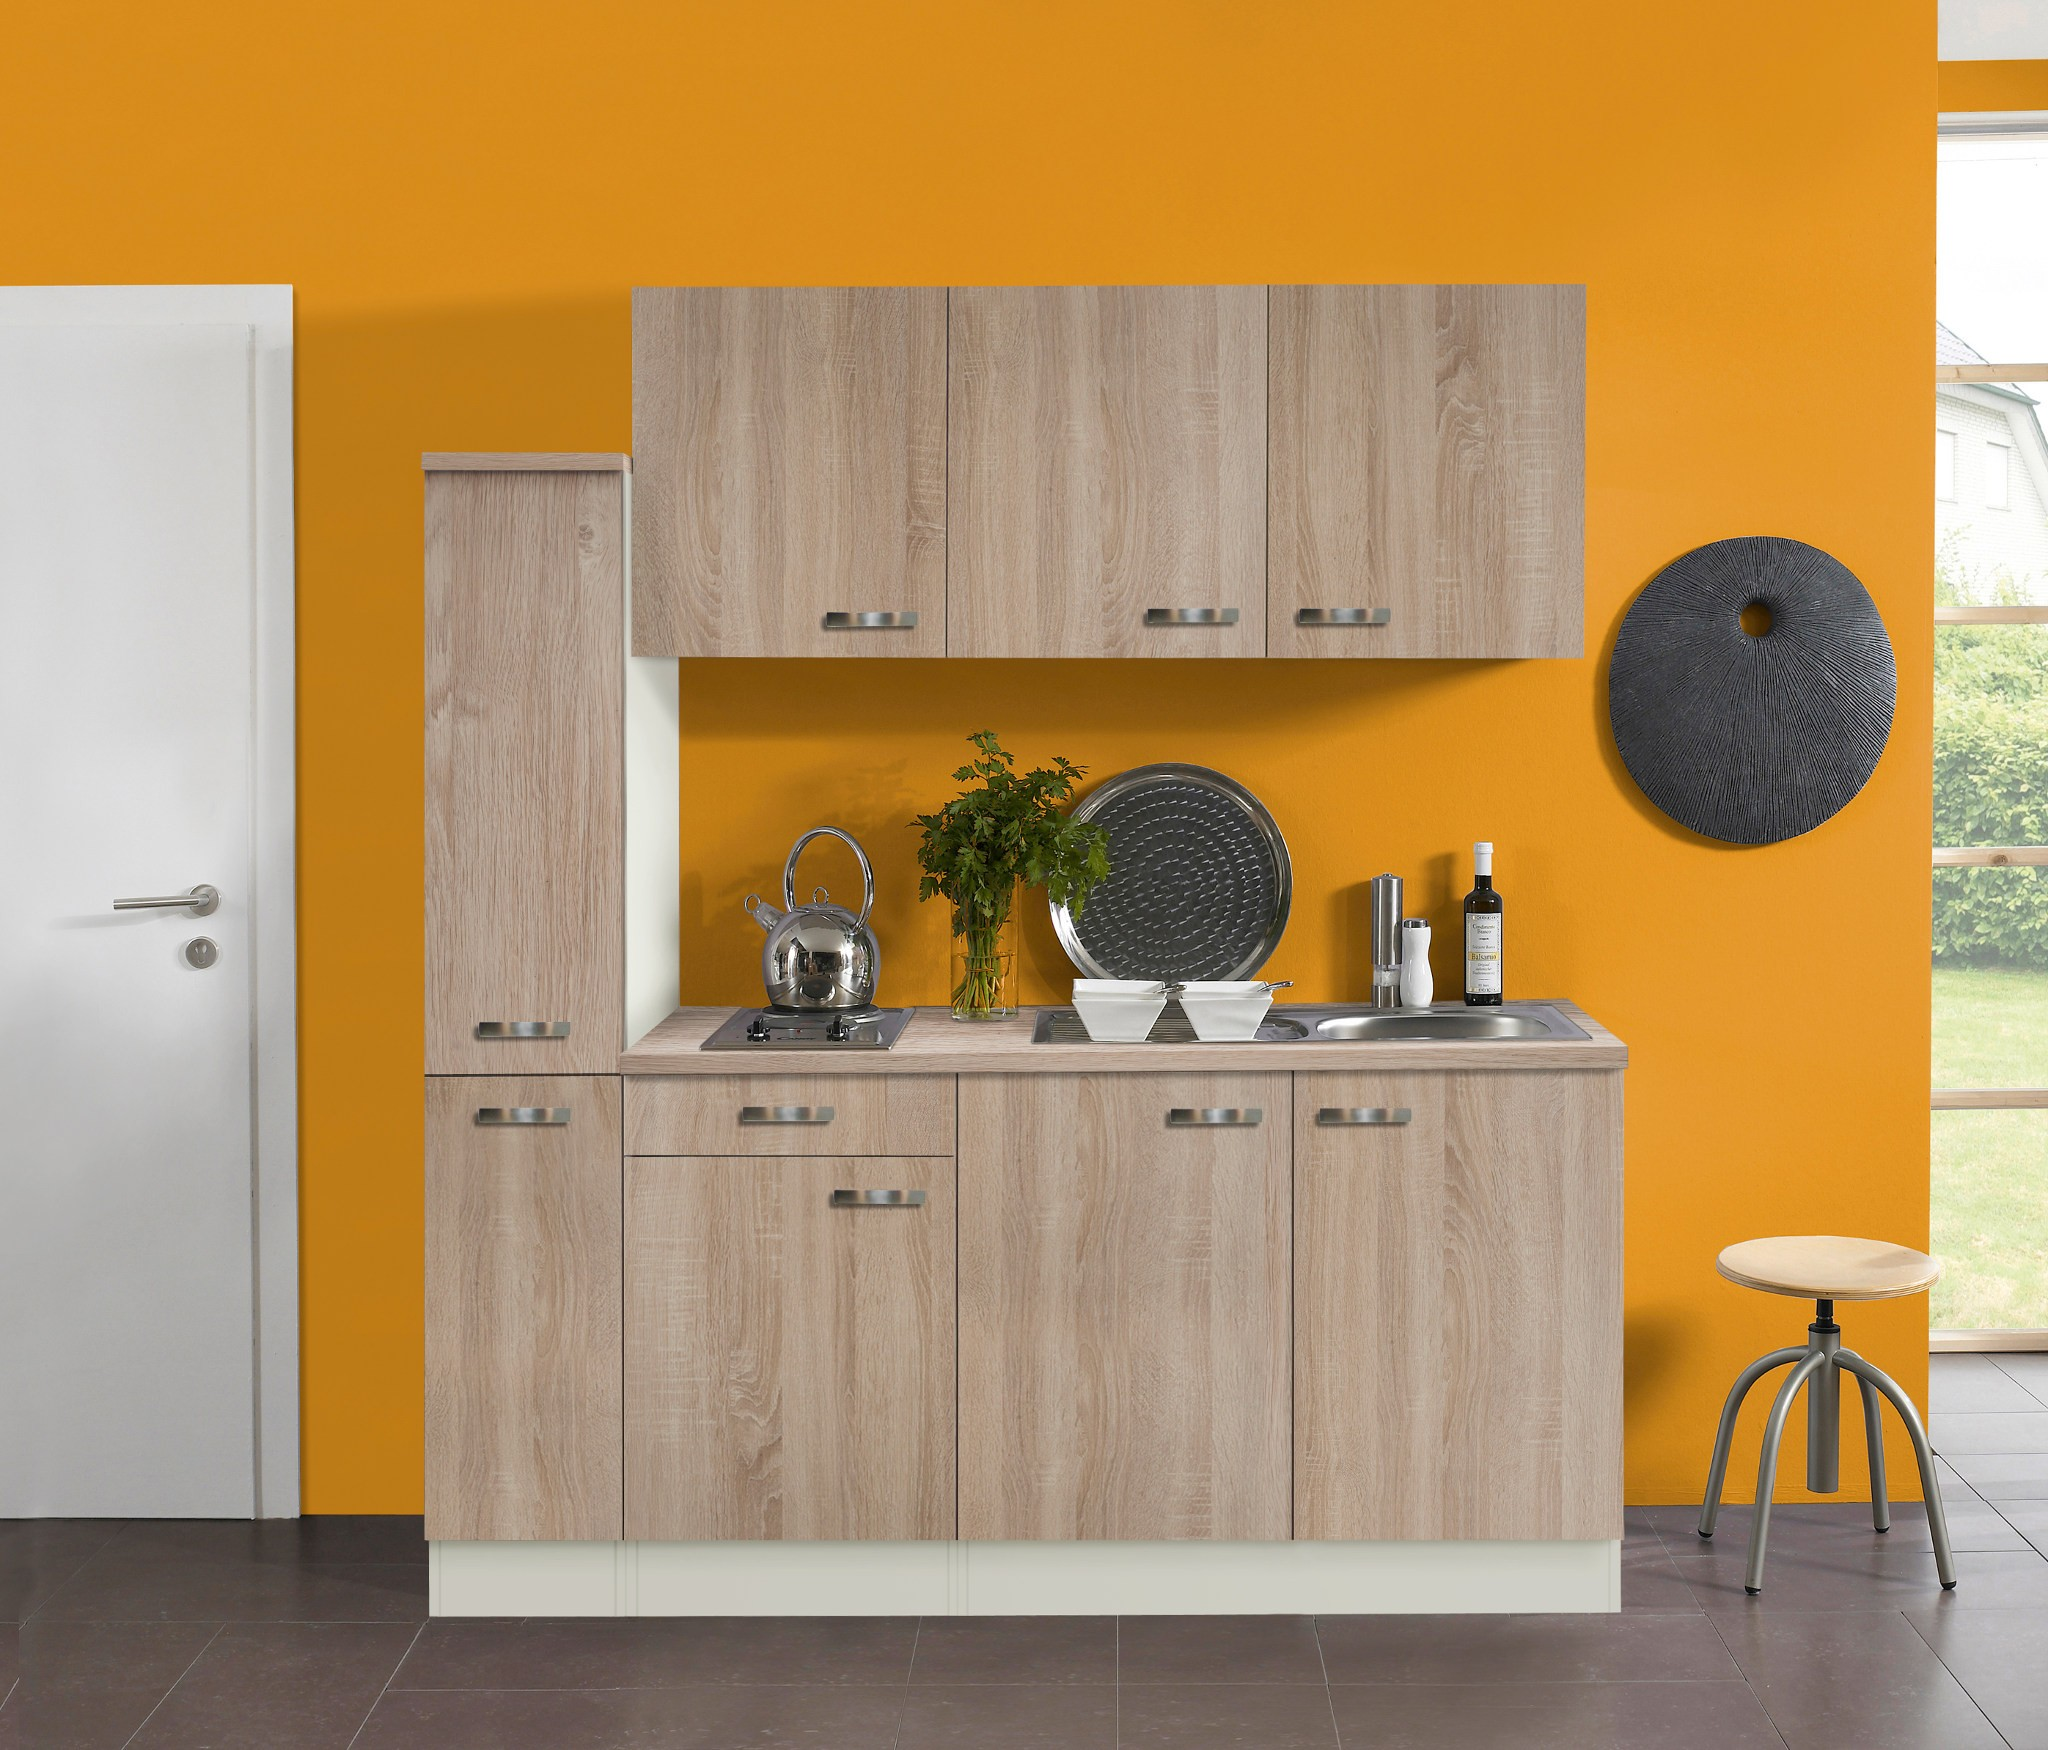 singlek che toledo mit elektro kochfeld 8 teilig breite 180 cm eiche k che singlek chen. Black Bedroom Furniture Sets. Home Design Ideas